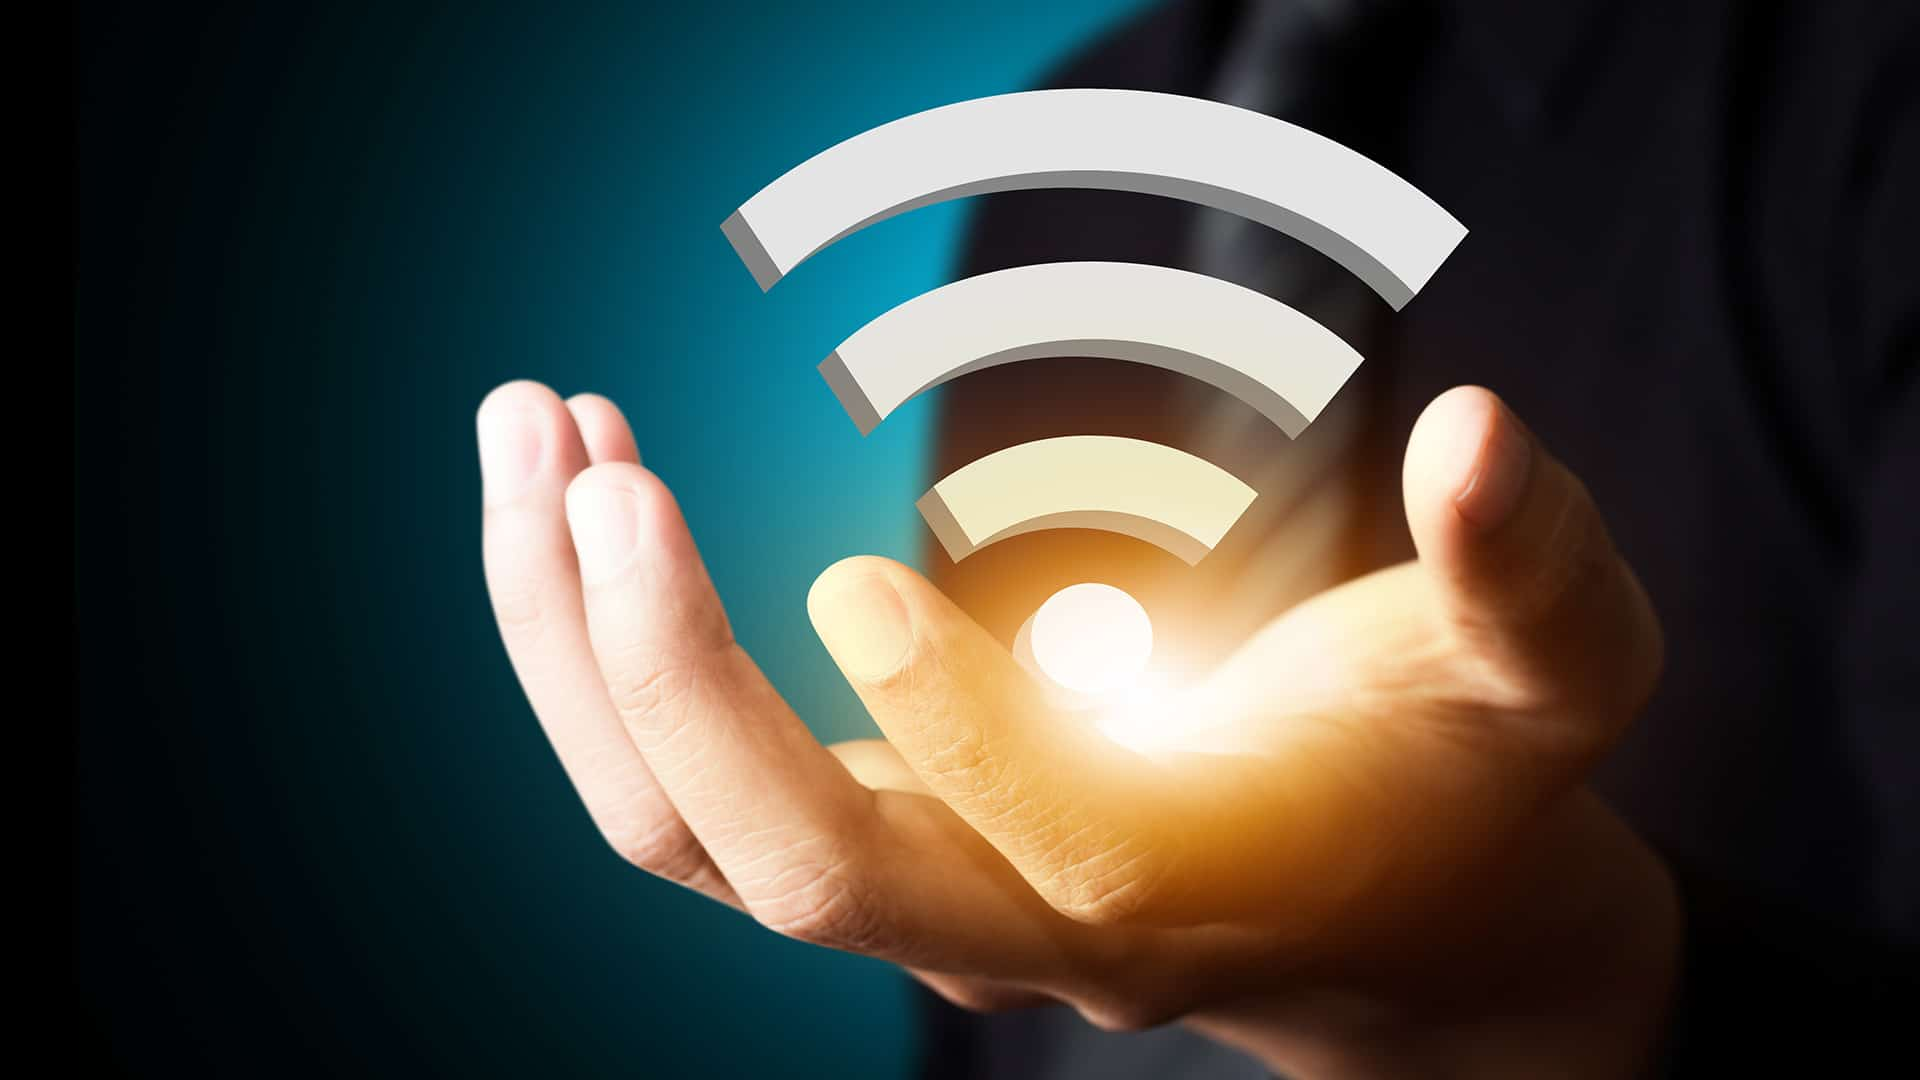 Wifi passif